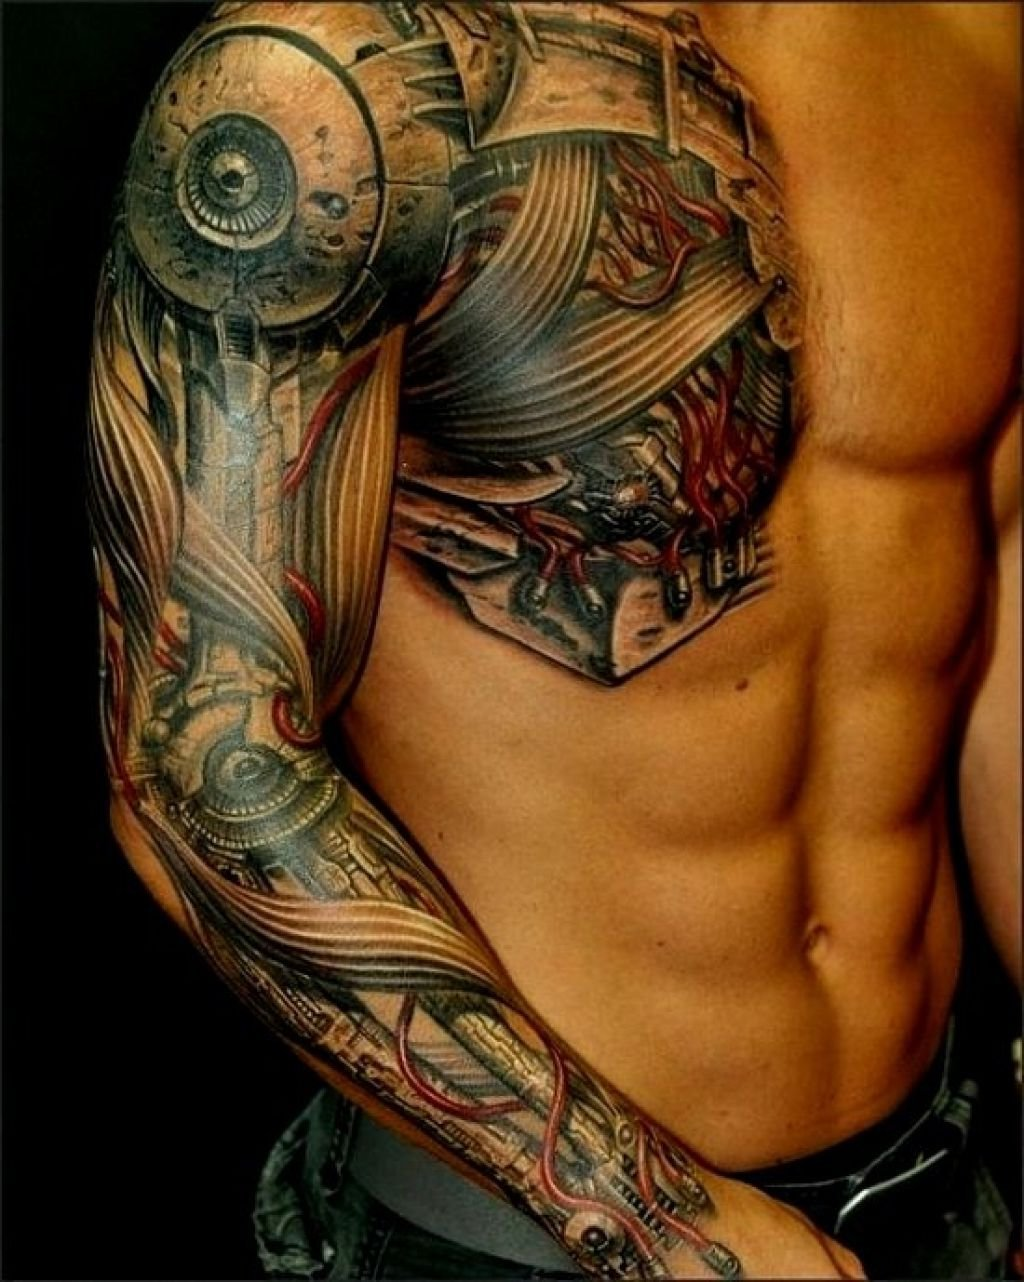 Фото татуировок для парня